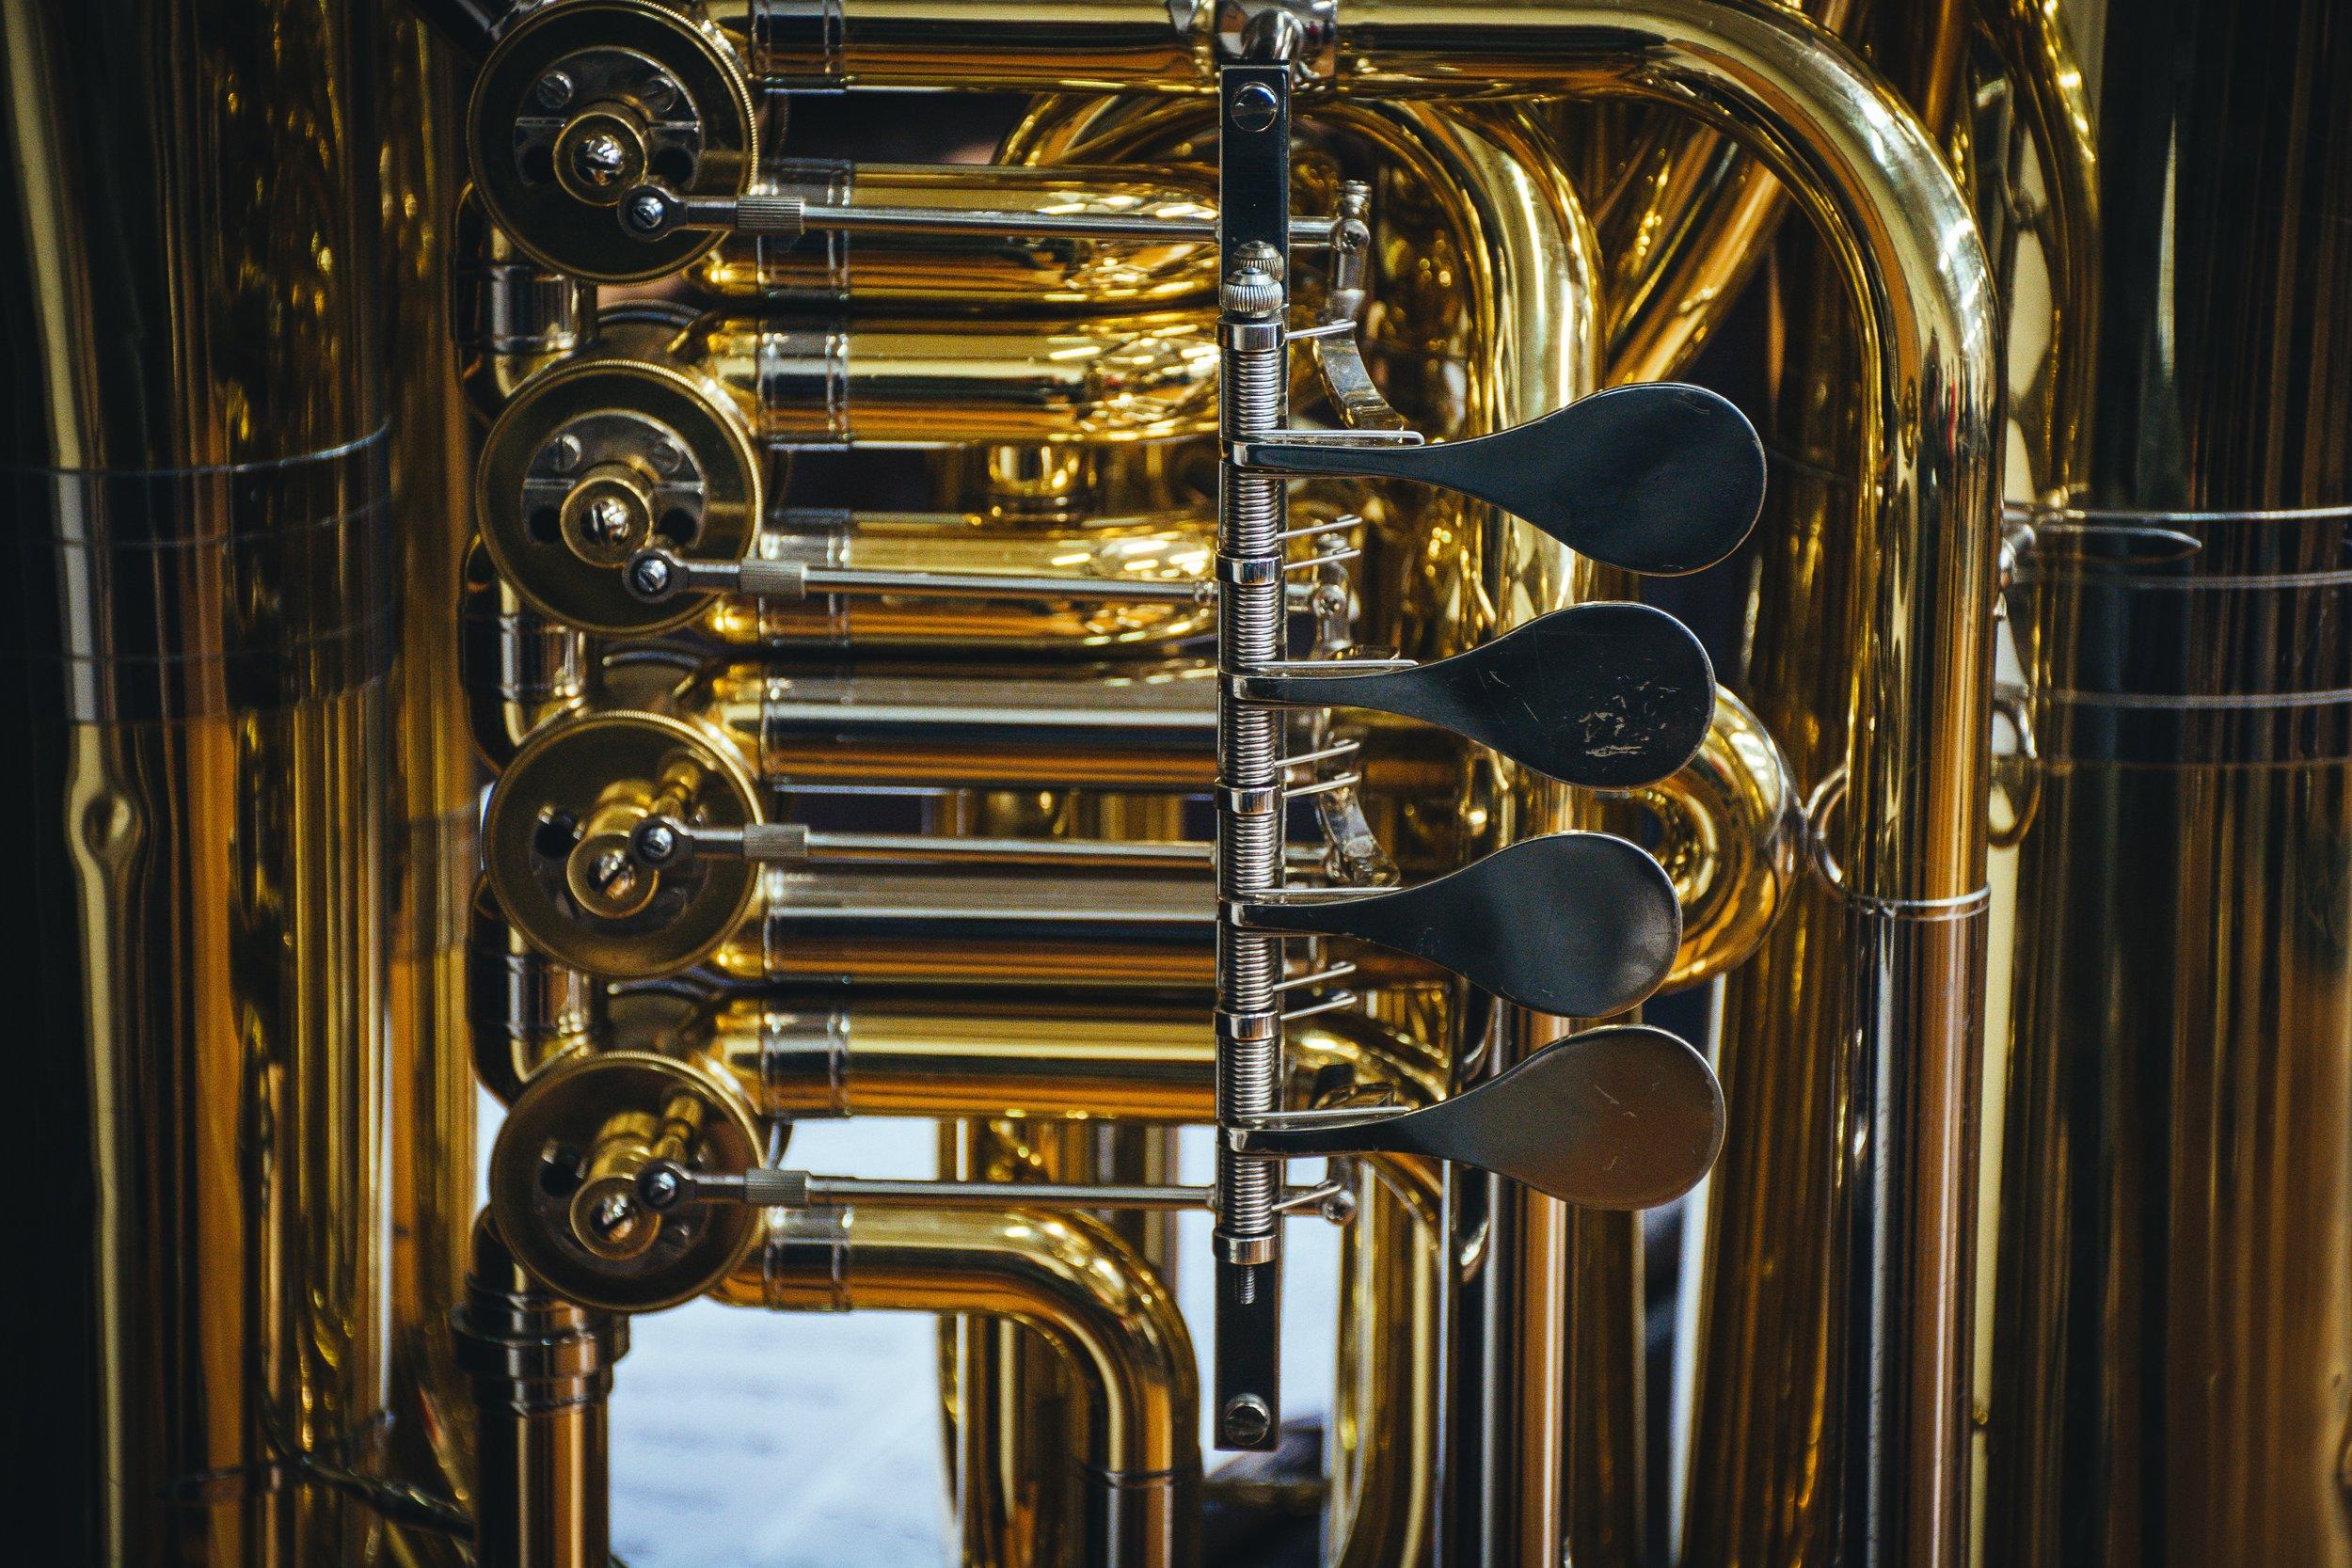 french horn samuel-ramos-1344178-unsplash.jpg